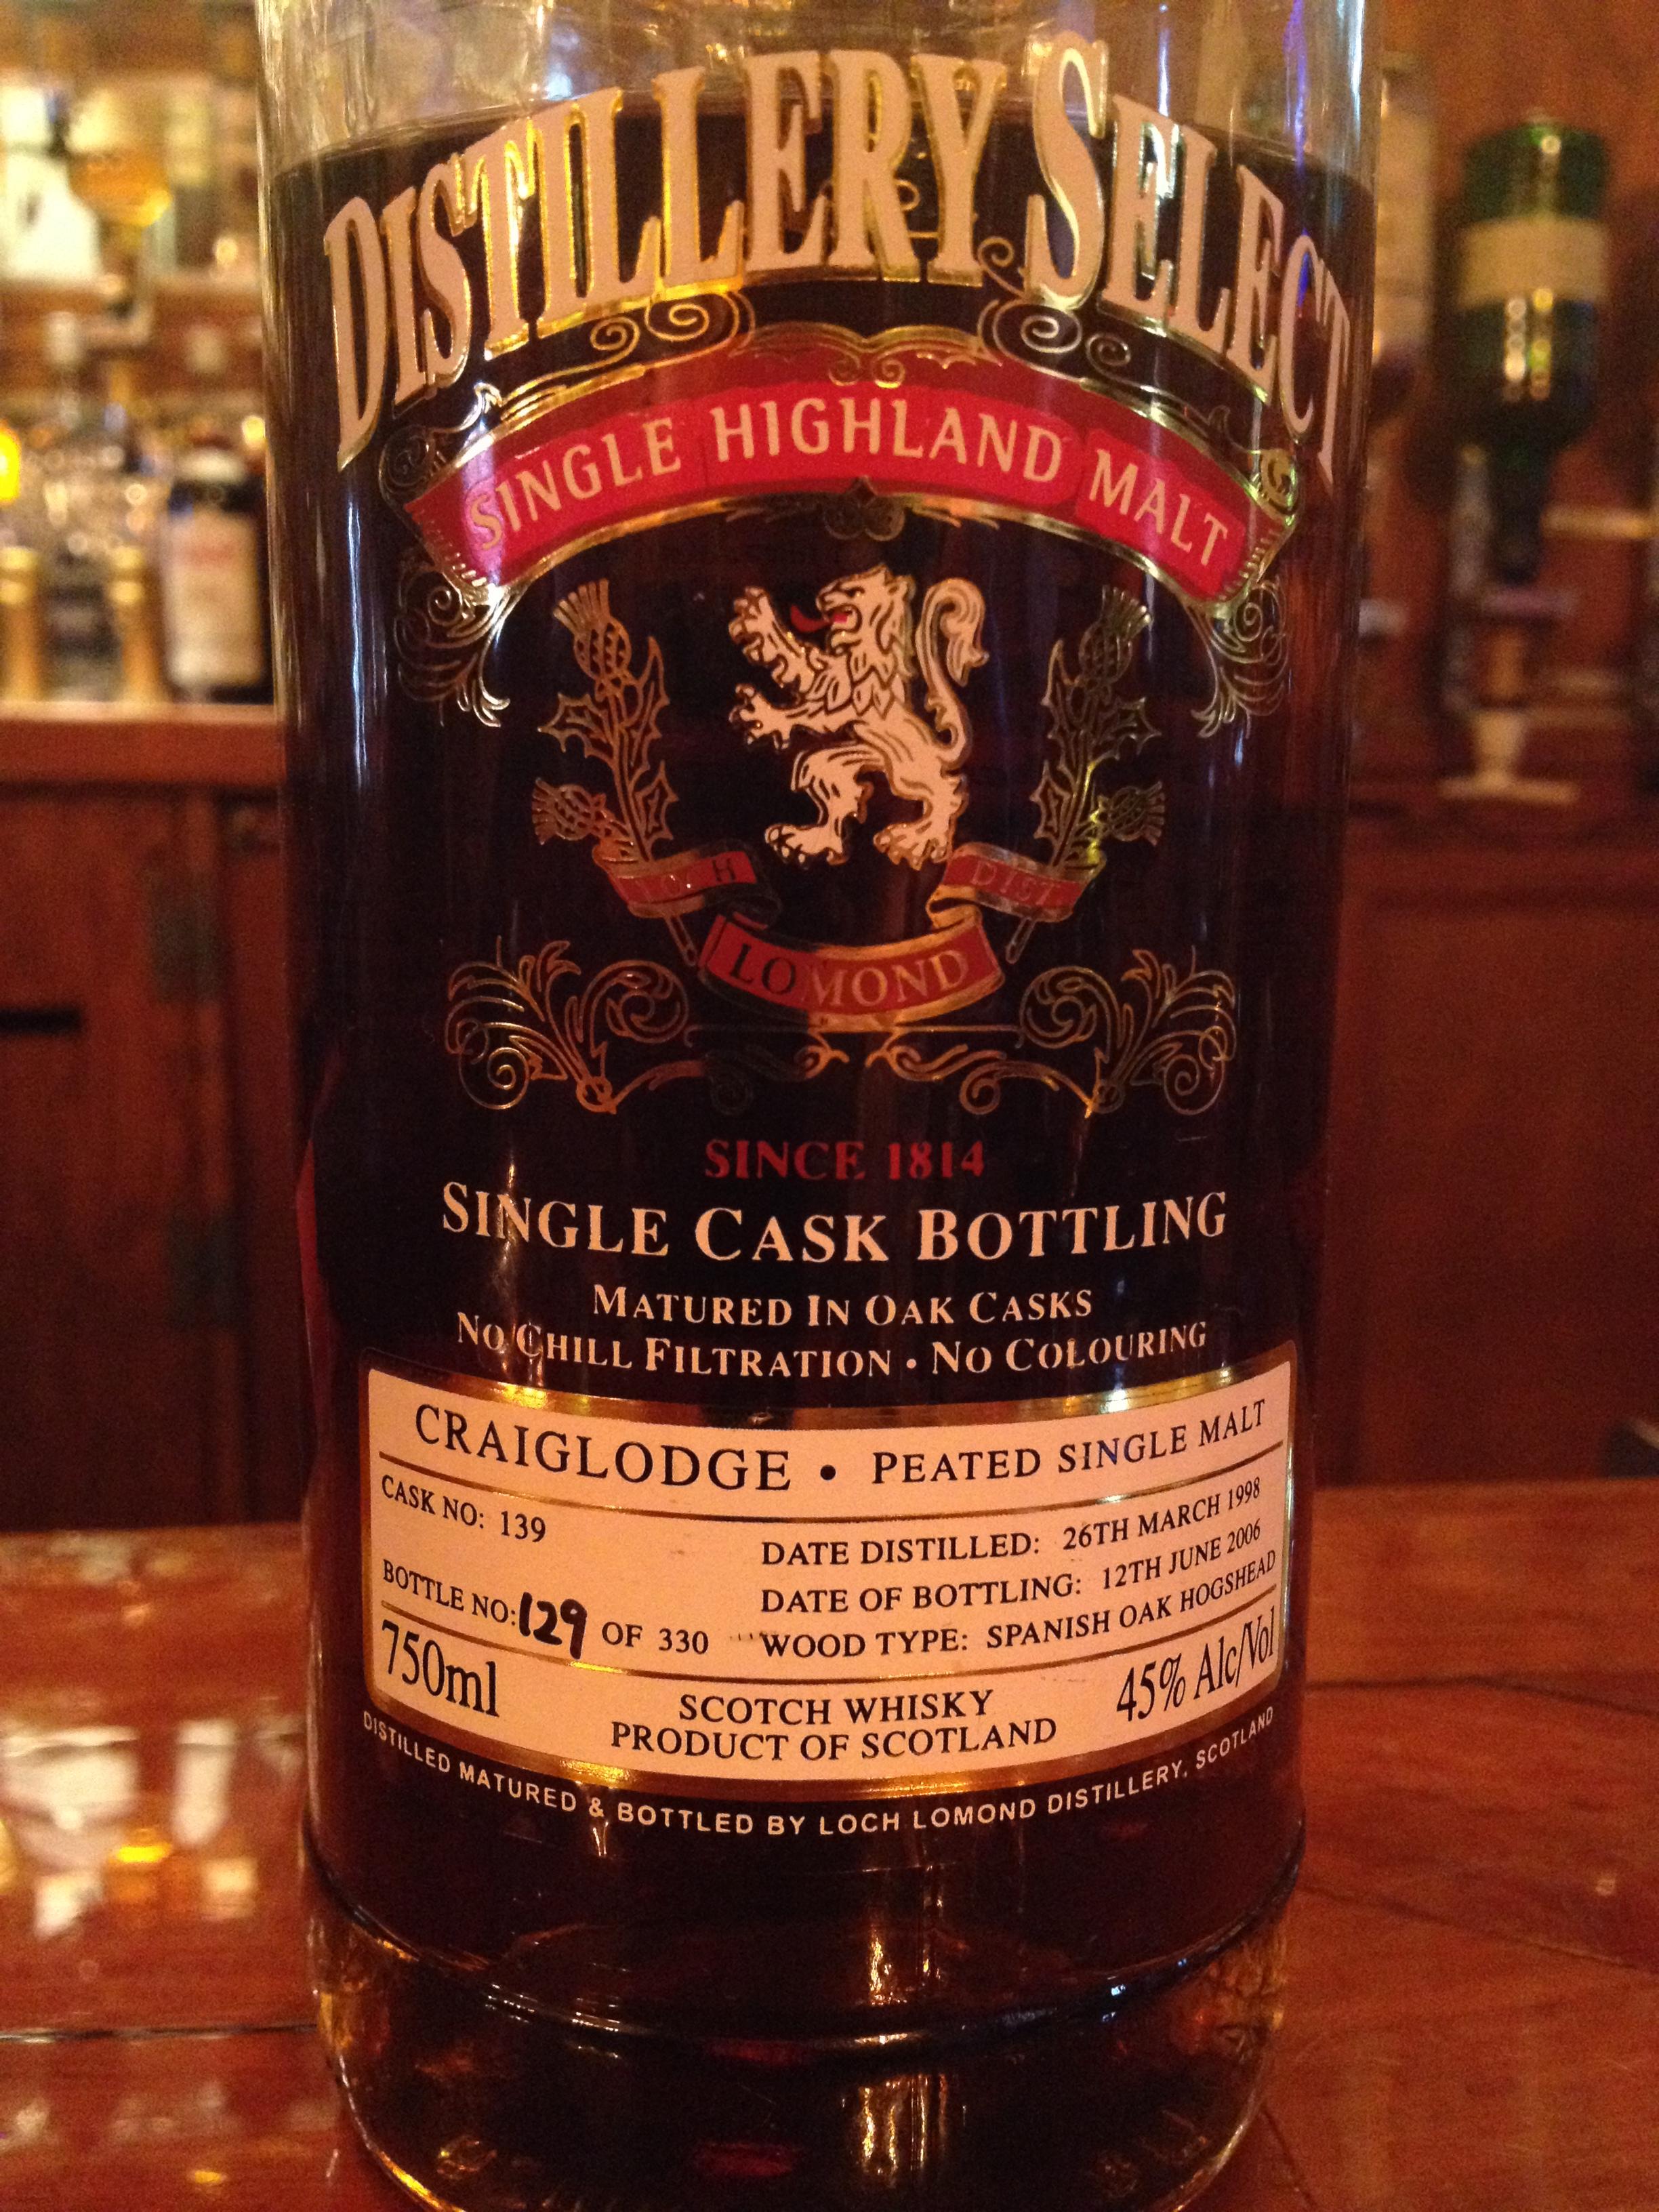 8 Year Old | 45% ABV - Distillery | Loch Lomond